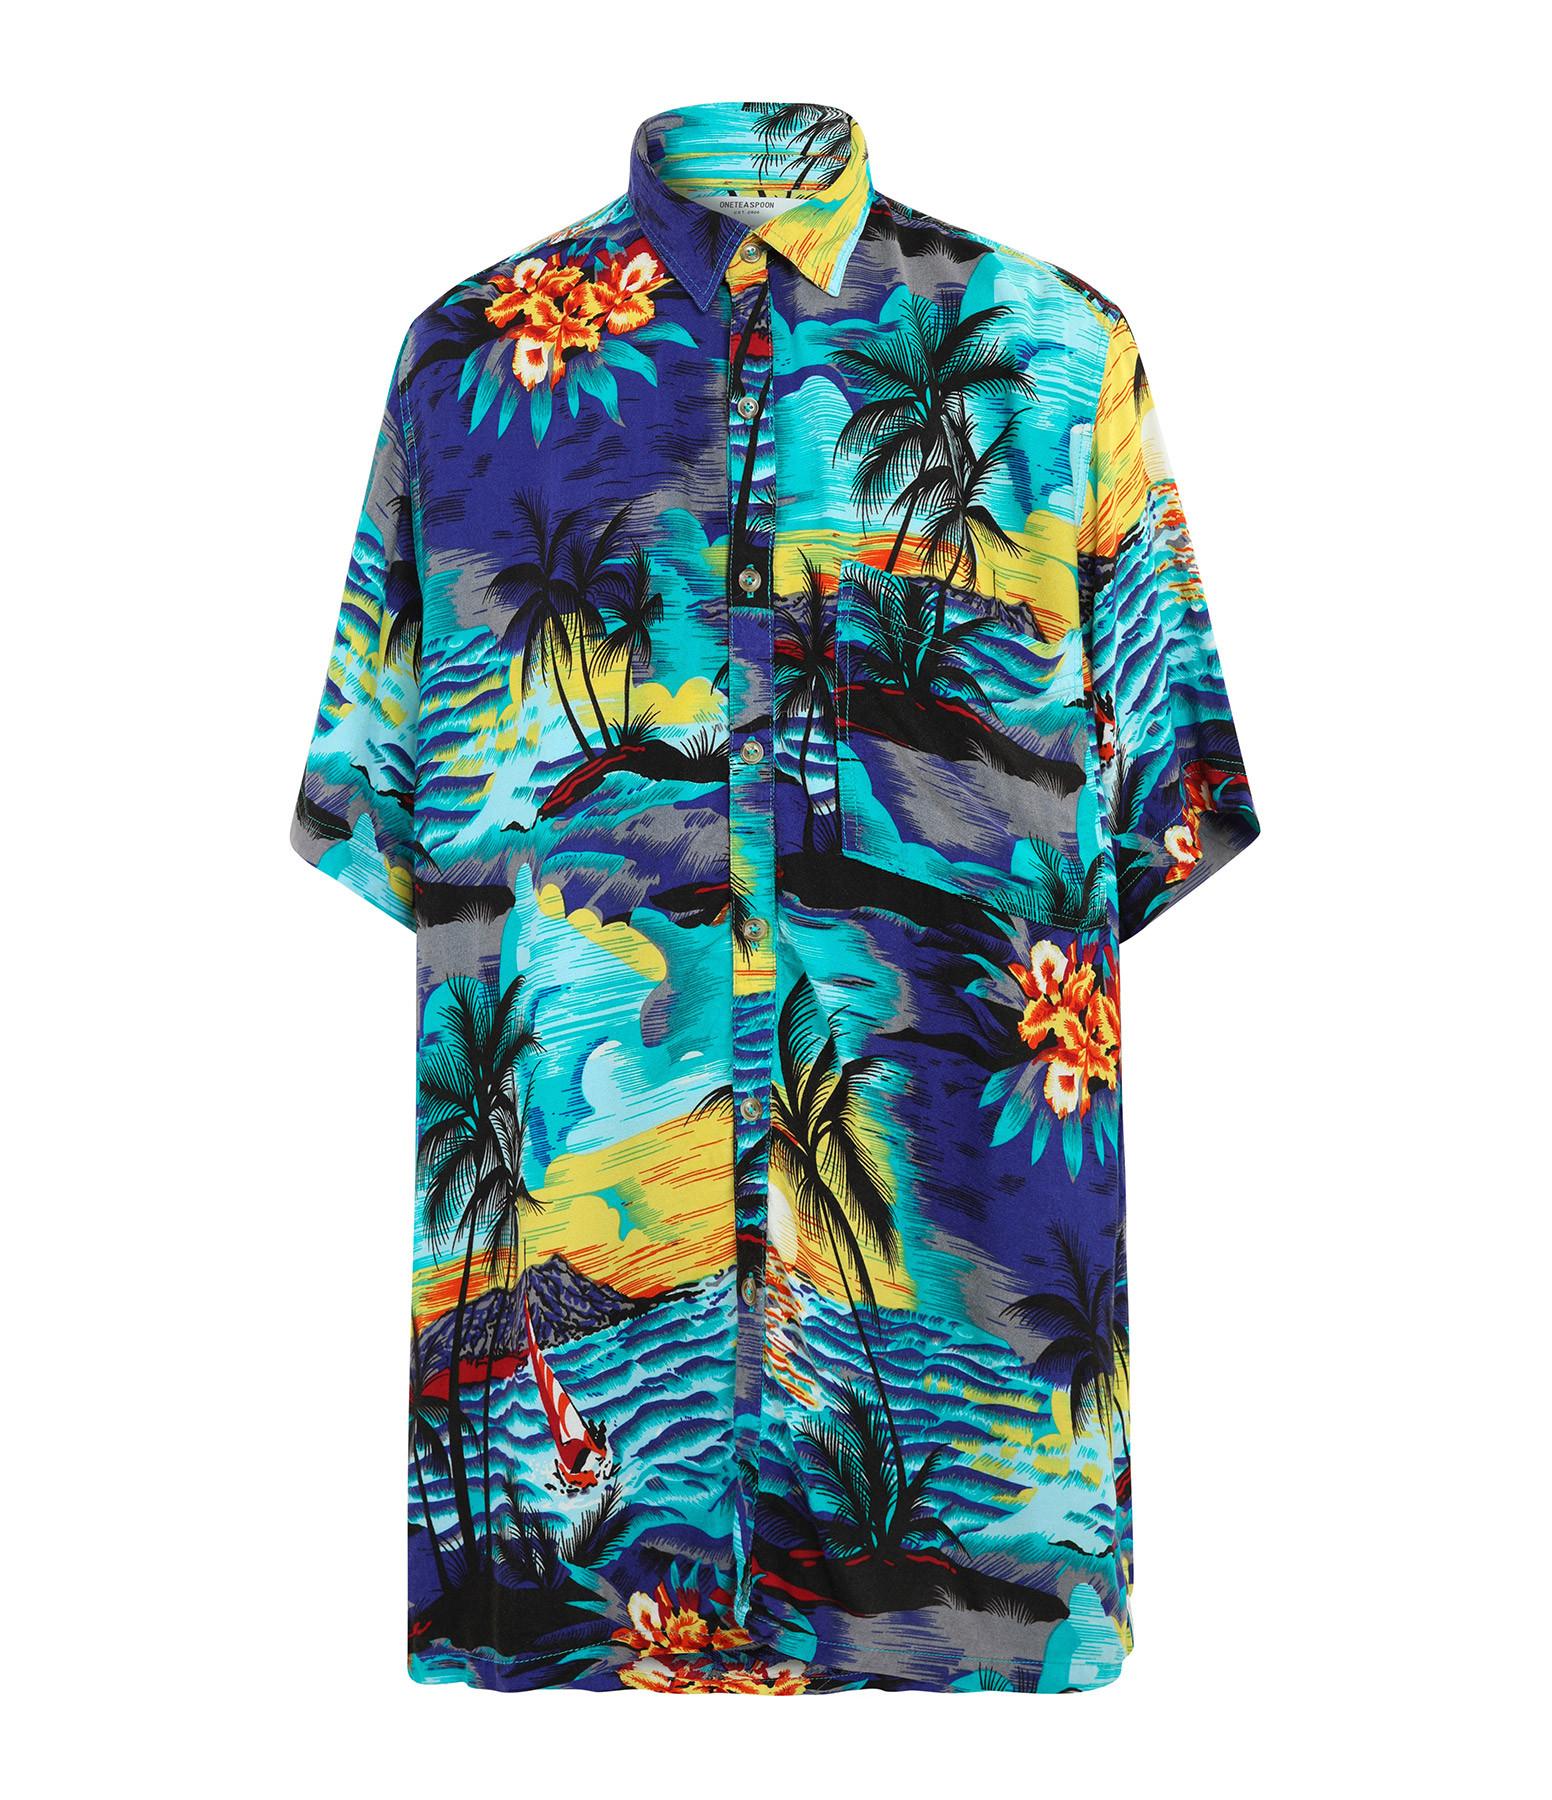 ONE TEASPOON - Chemise Hawaiian Bleu